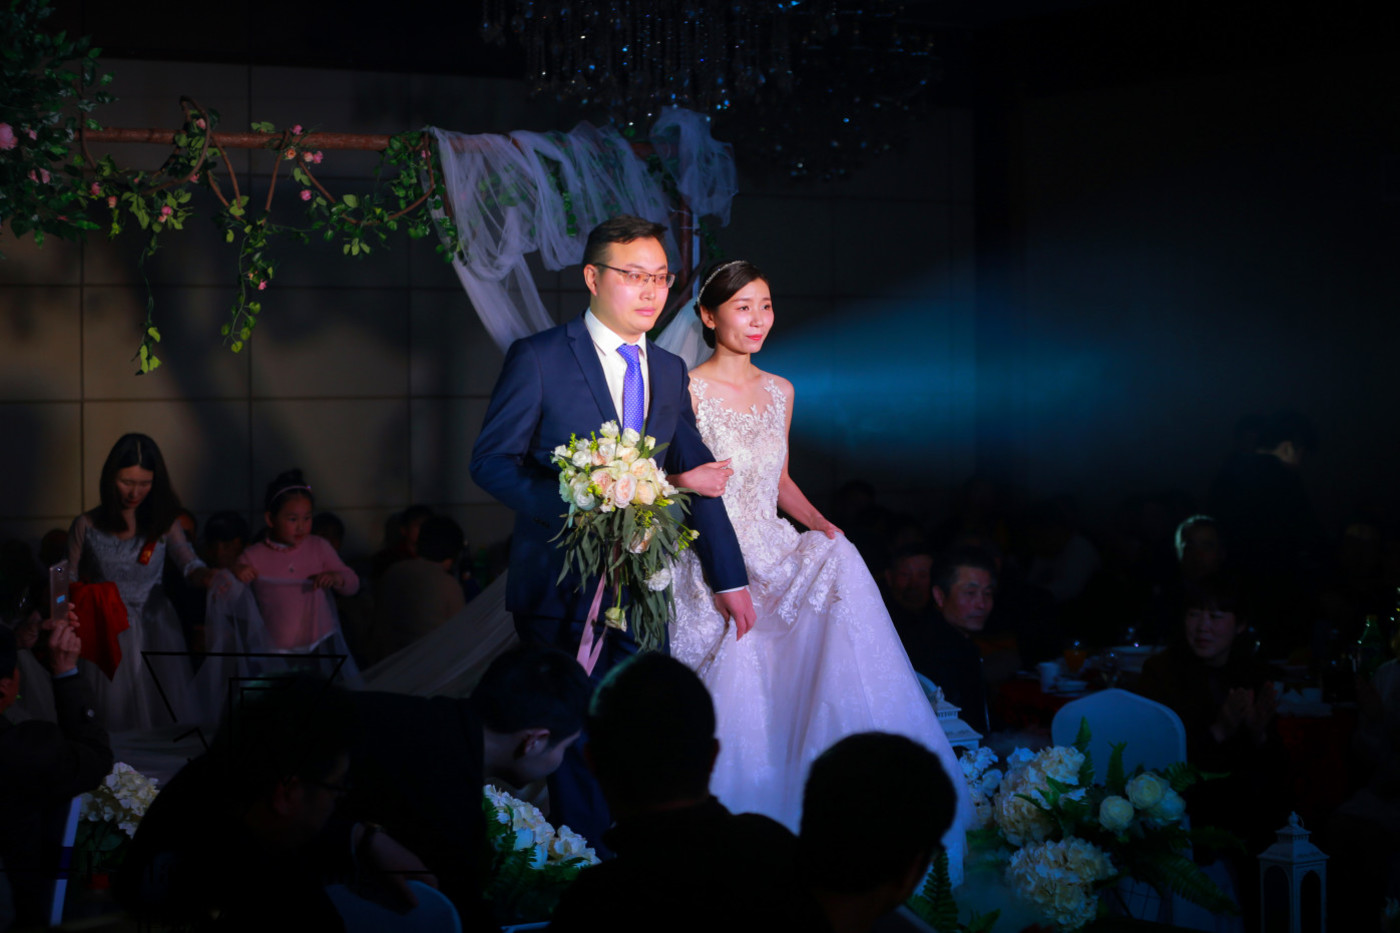 「Fantasy Wedding」& A/P 南艳湖23